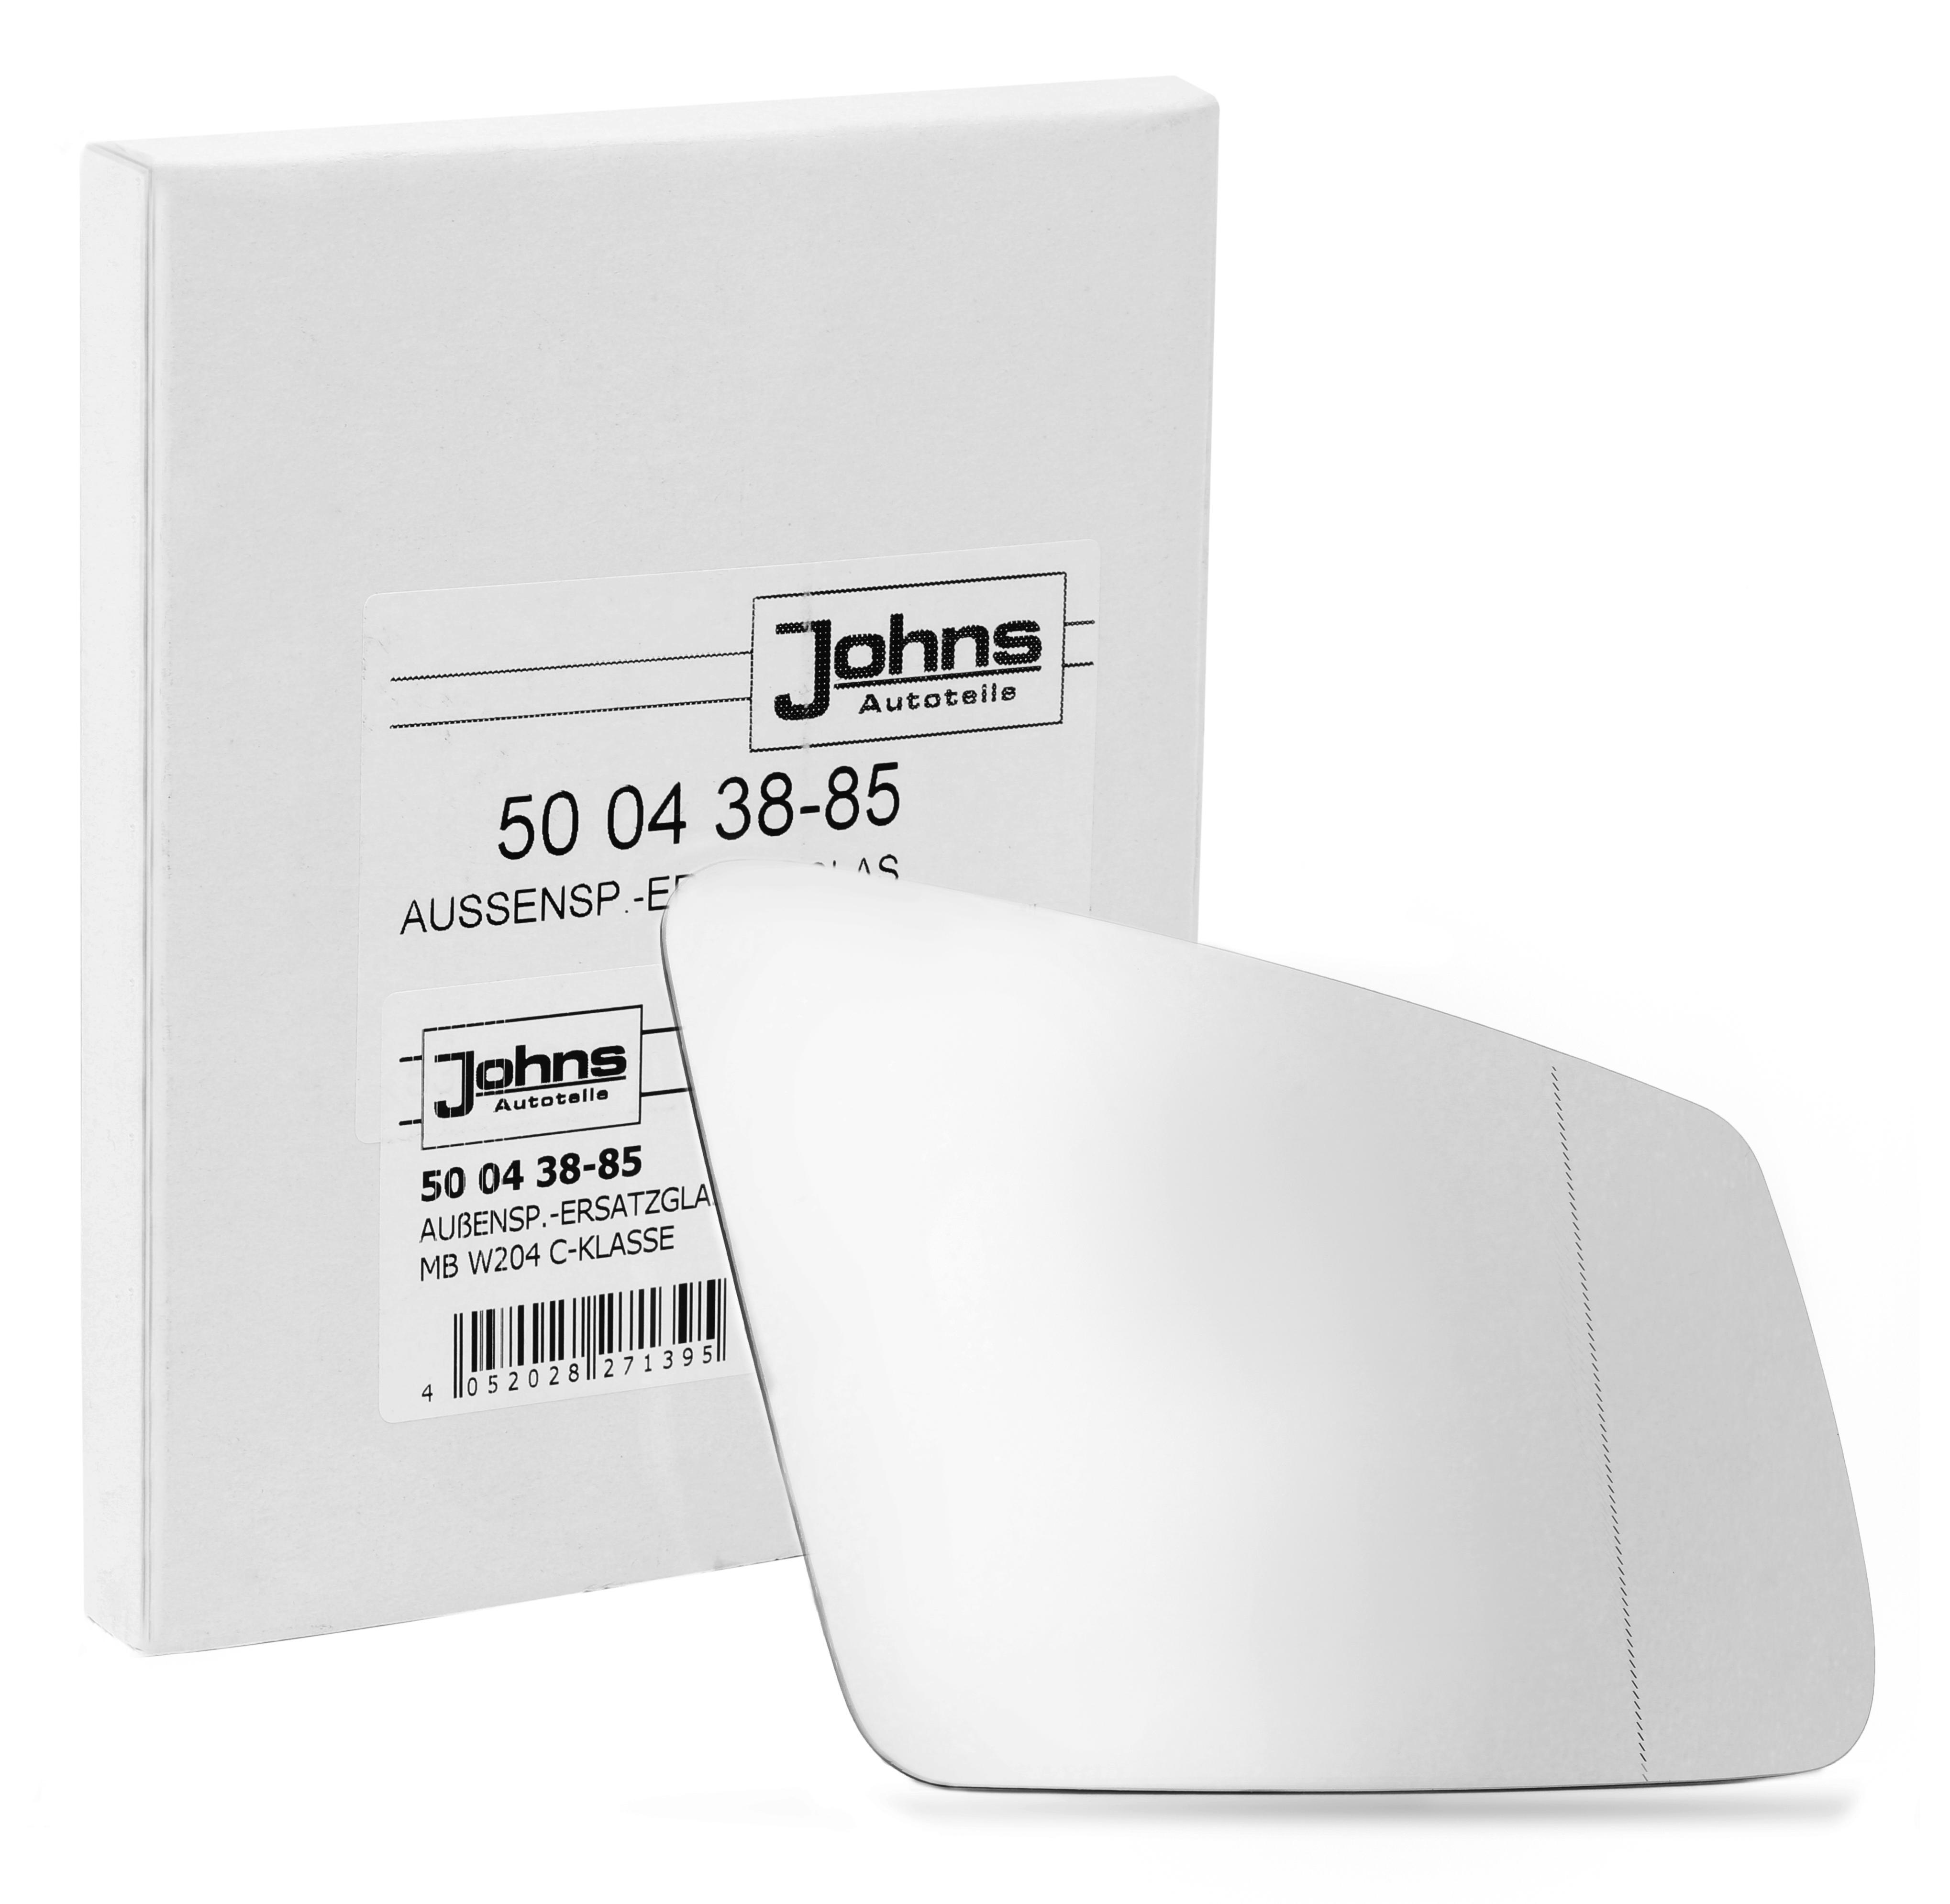 MERCEDES-BENZ GLE Seitenspiegel - Original JOHNS 50 04 38-85